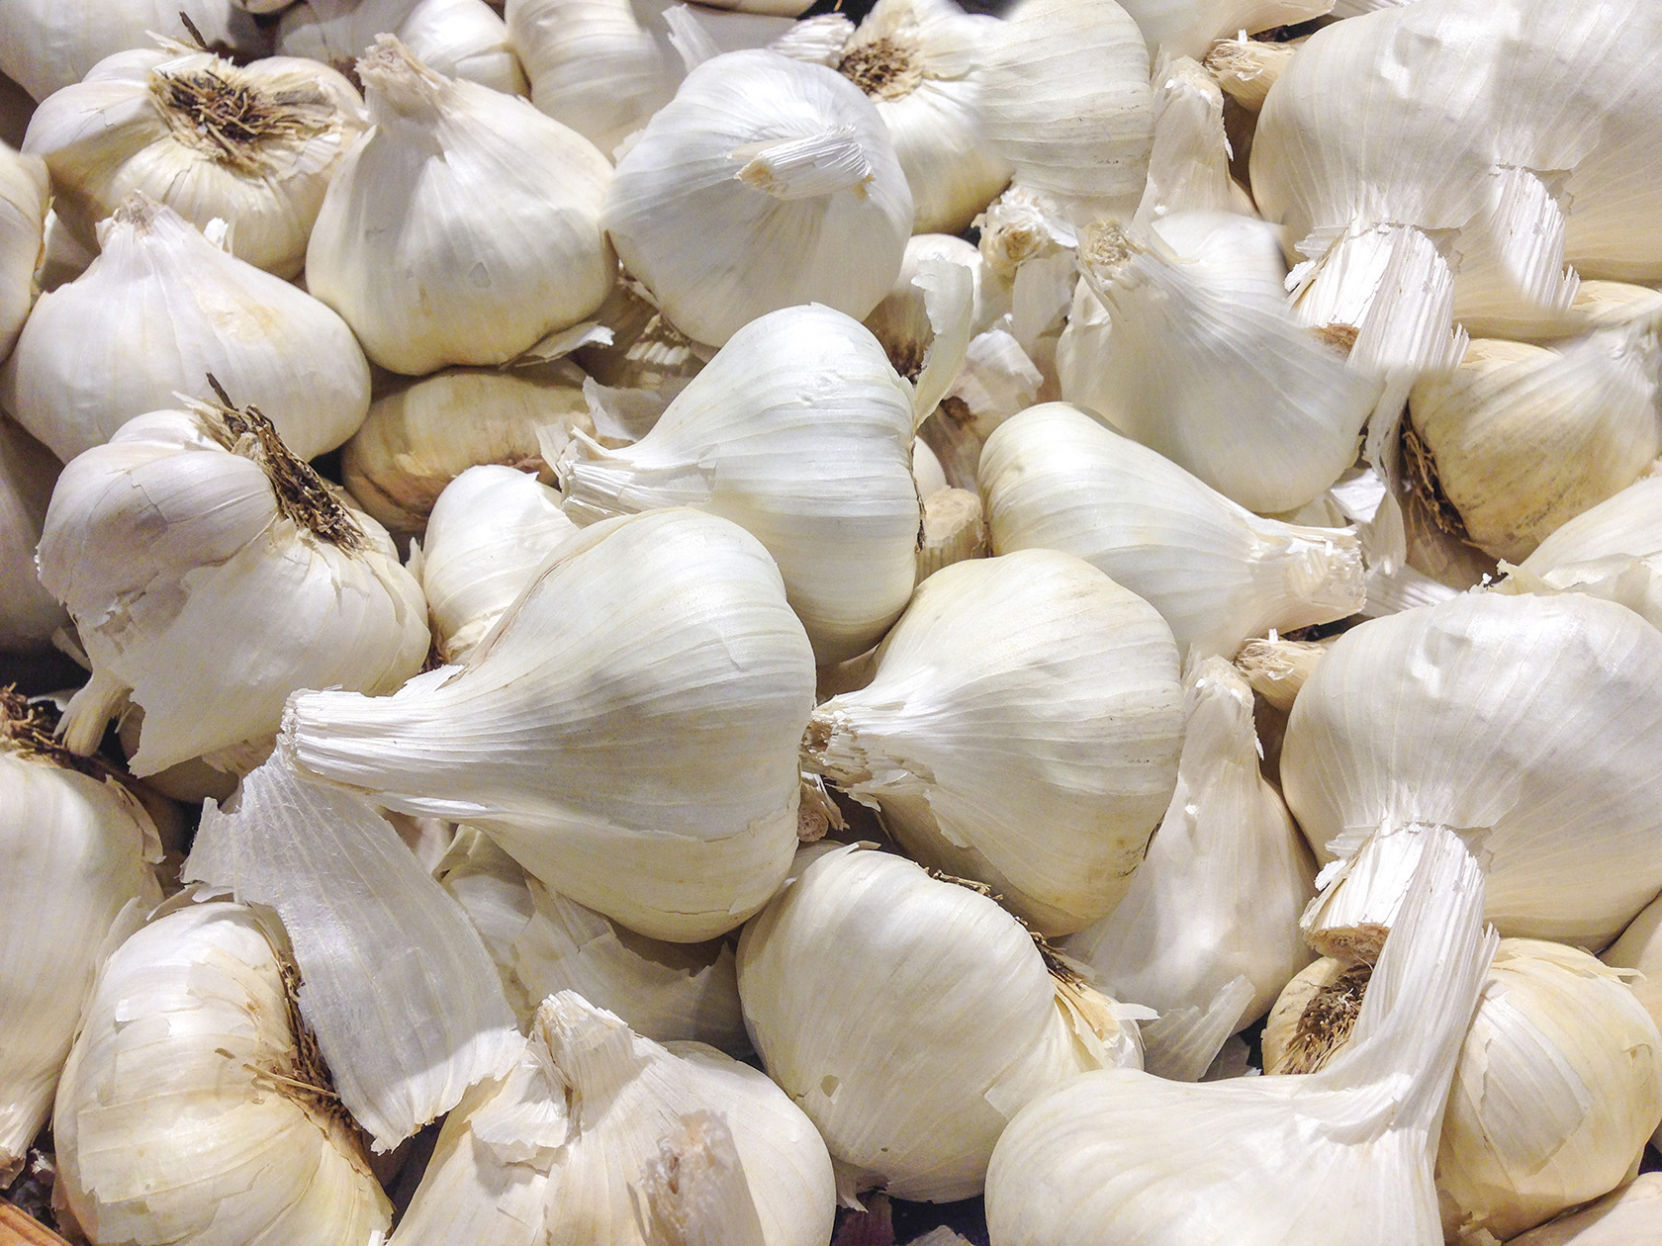 Planting garlic in 2019: calendar 26